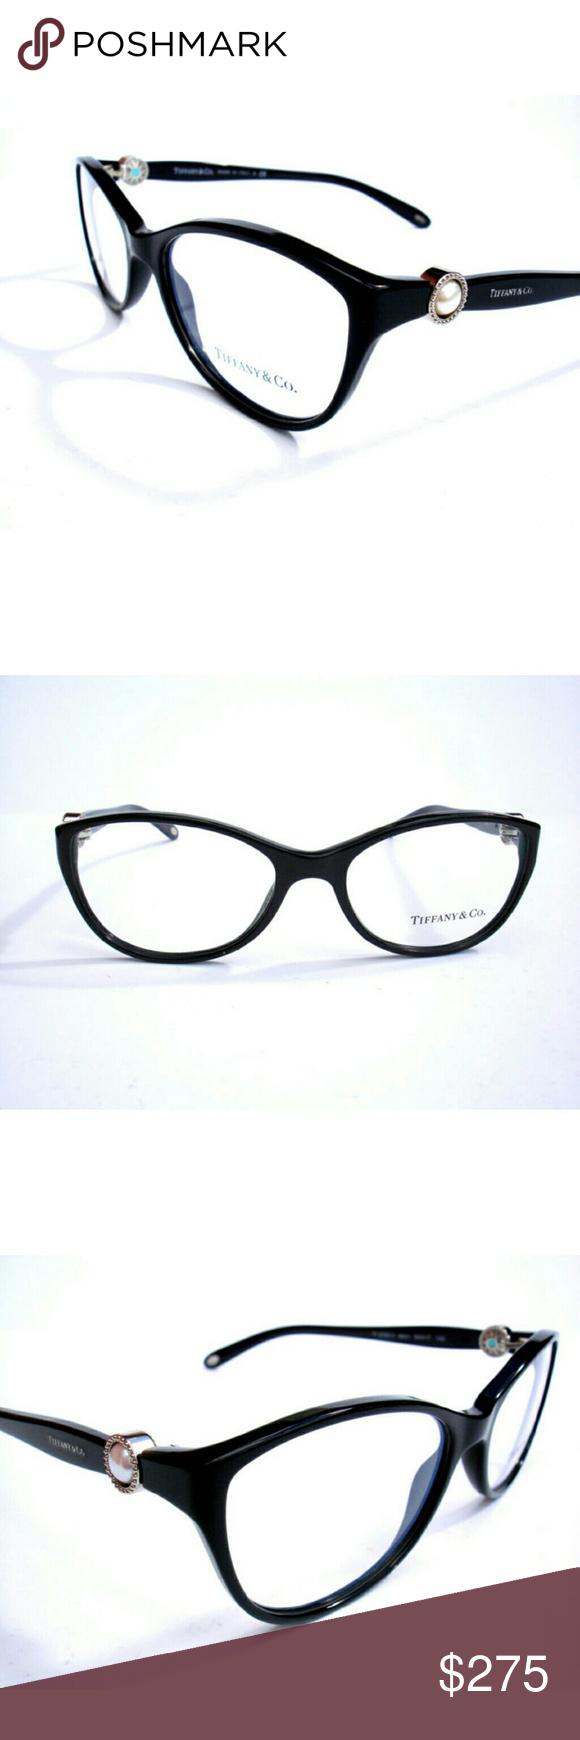 9b2d8a3393eb Tiffany   CO Eyeglasses Tiffany   Co Eyeglasses Authentic Black frame Size  54-17-